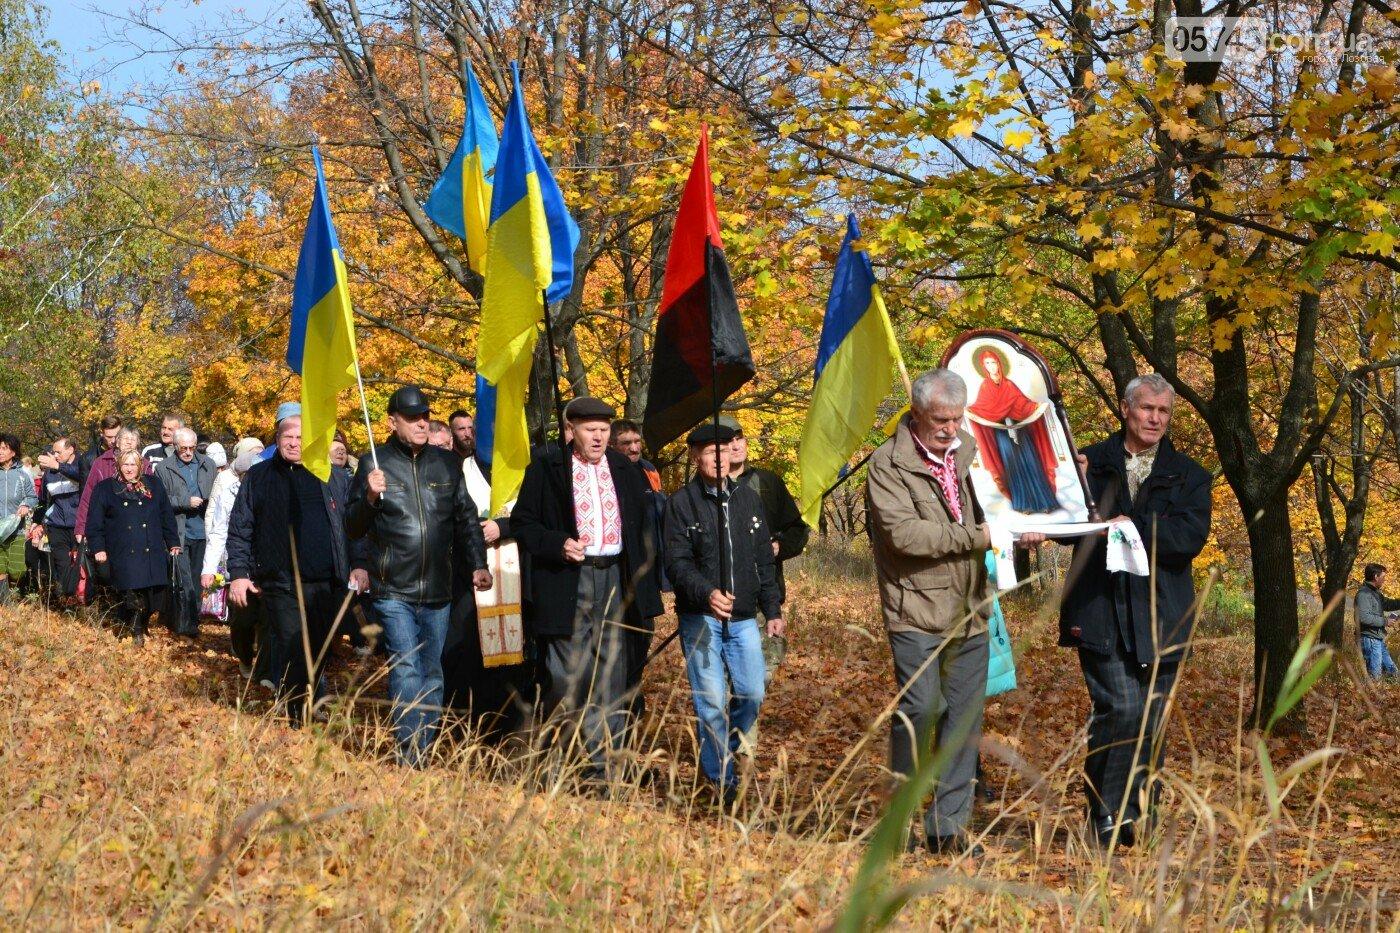 Без масок и карантина: как Лозовщина праздновала День защитника Украины год назад (ФОТО), фото-28